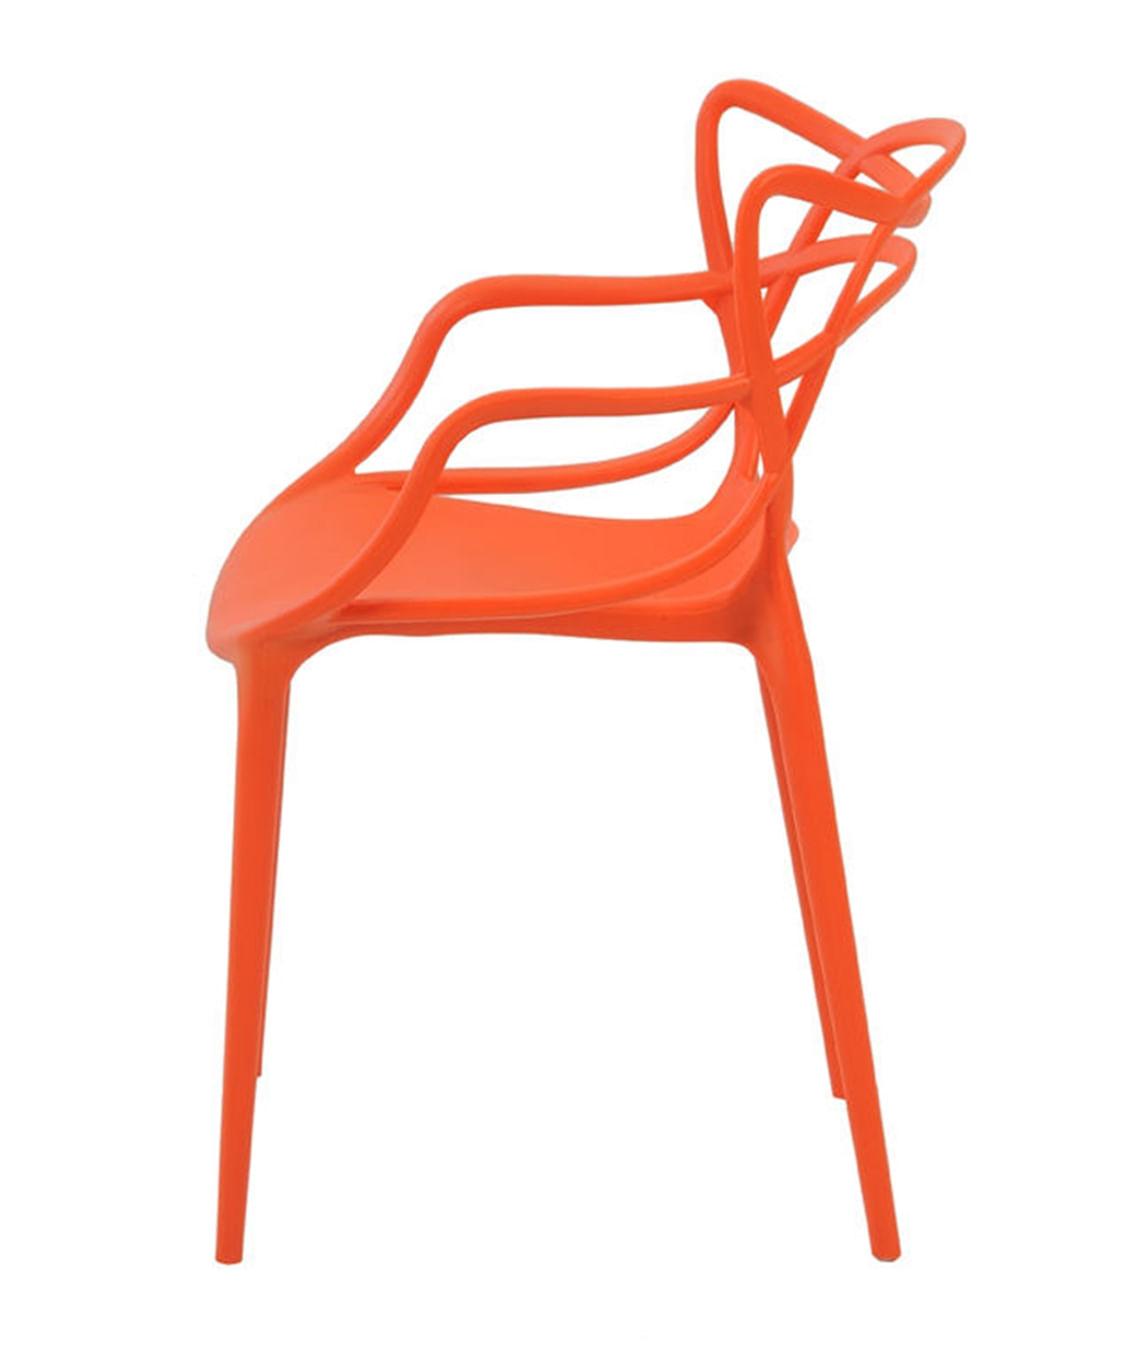 Cadeira Allegra em Polipropileno cor Laranja - 44935